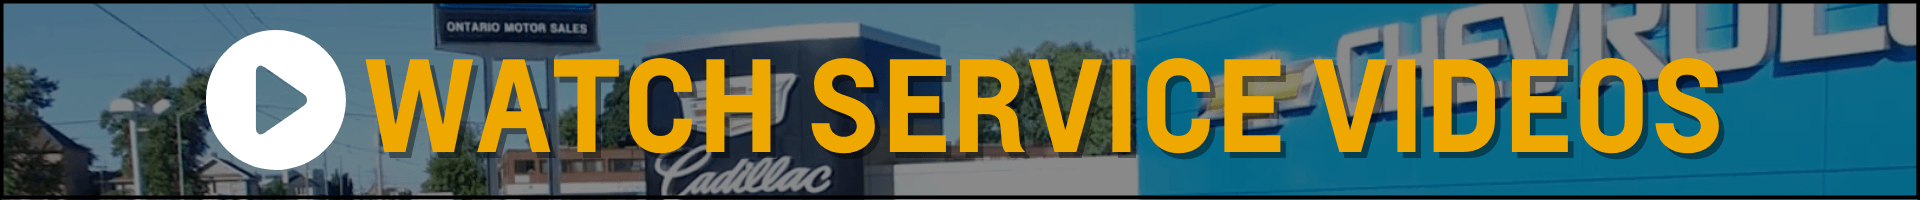 Watch OMS Service Videos